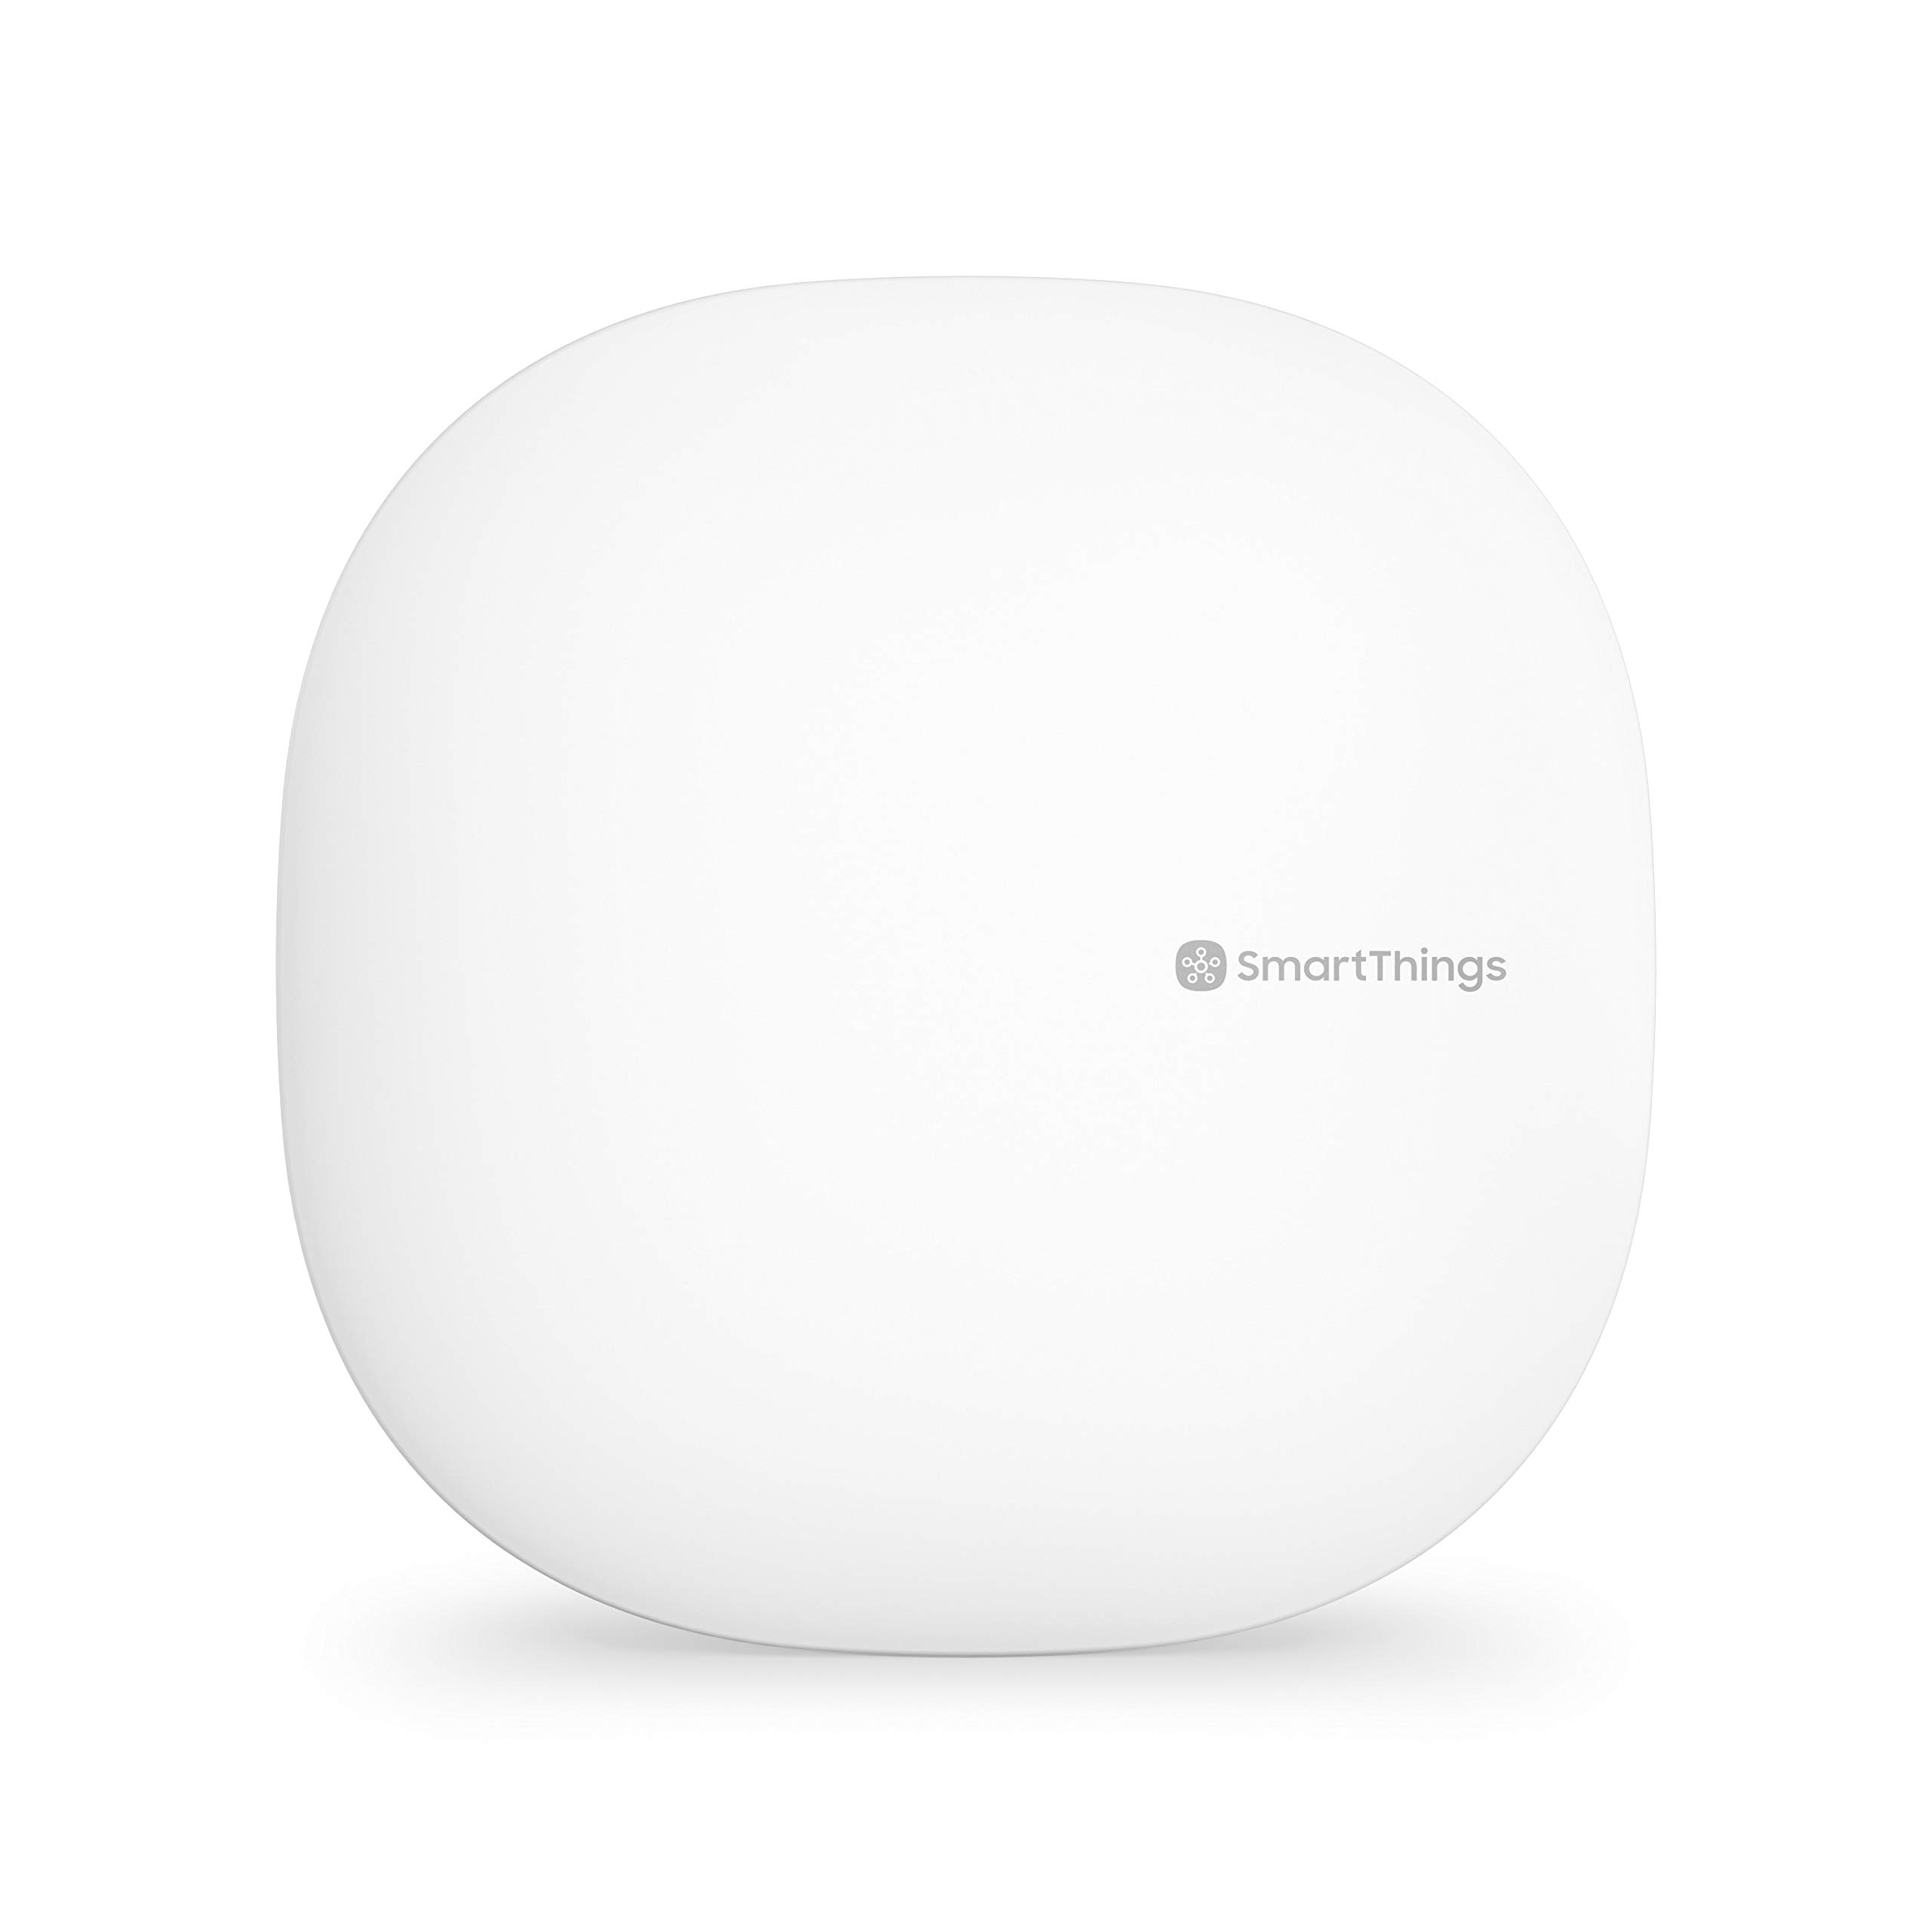 Samsung SmartThings Hub 3rd Generation [GP-U999SJVLGDA] Smart Home  Automation Hub Home Monitoring Smart Devices - Alexa Google Home Compatible  -